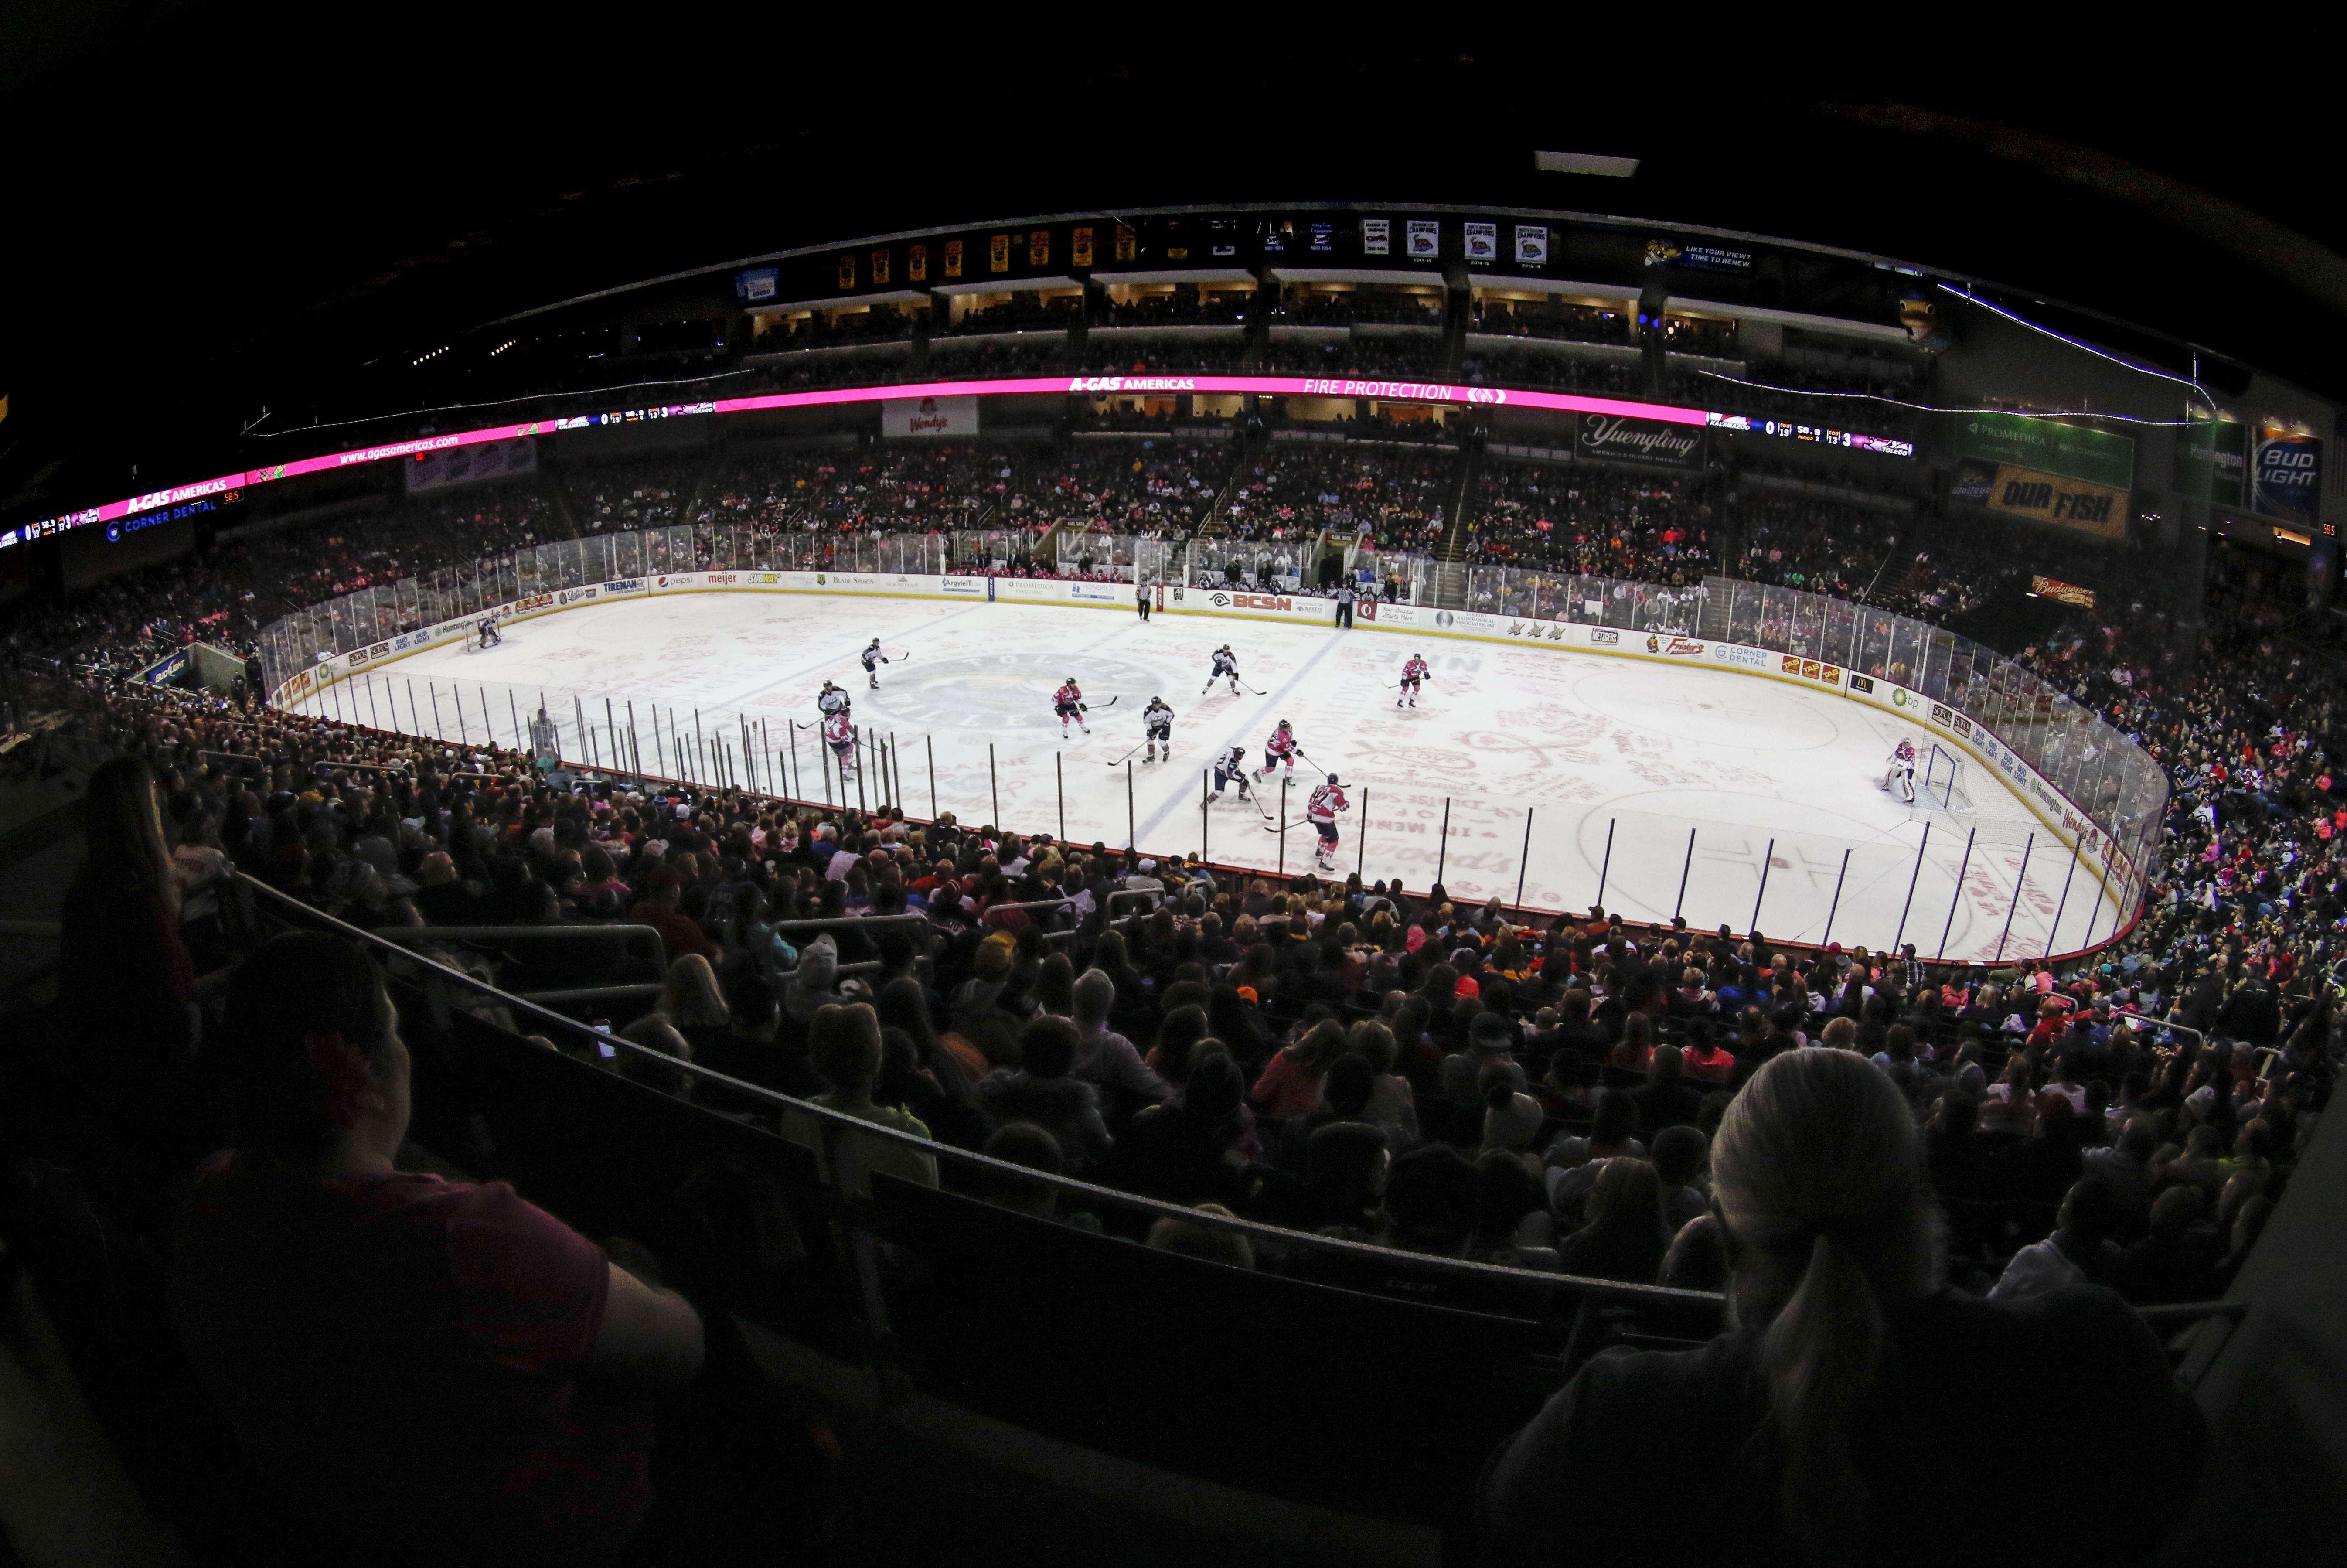 ECHL: Walleye Notch 3-2 Overtime Win Against Tulsa